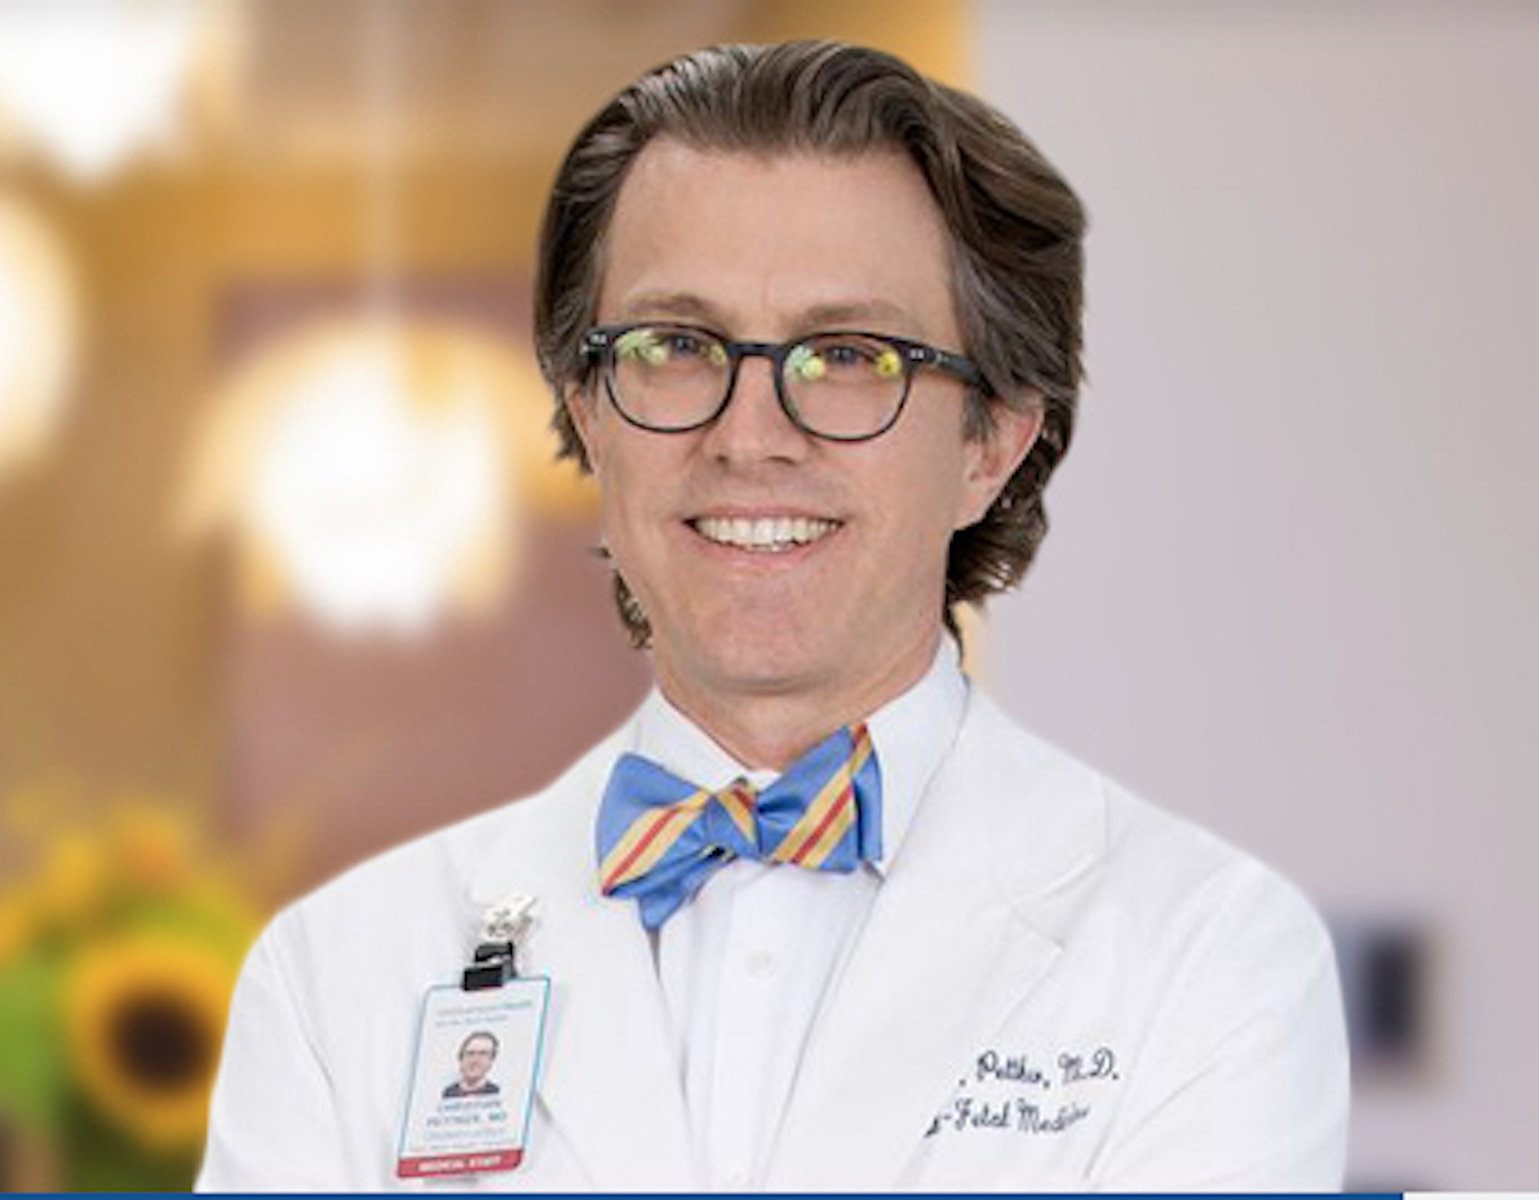 Christian Pettker, MD > Obstetrics, Gynecology